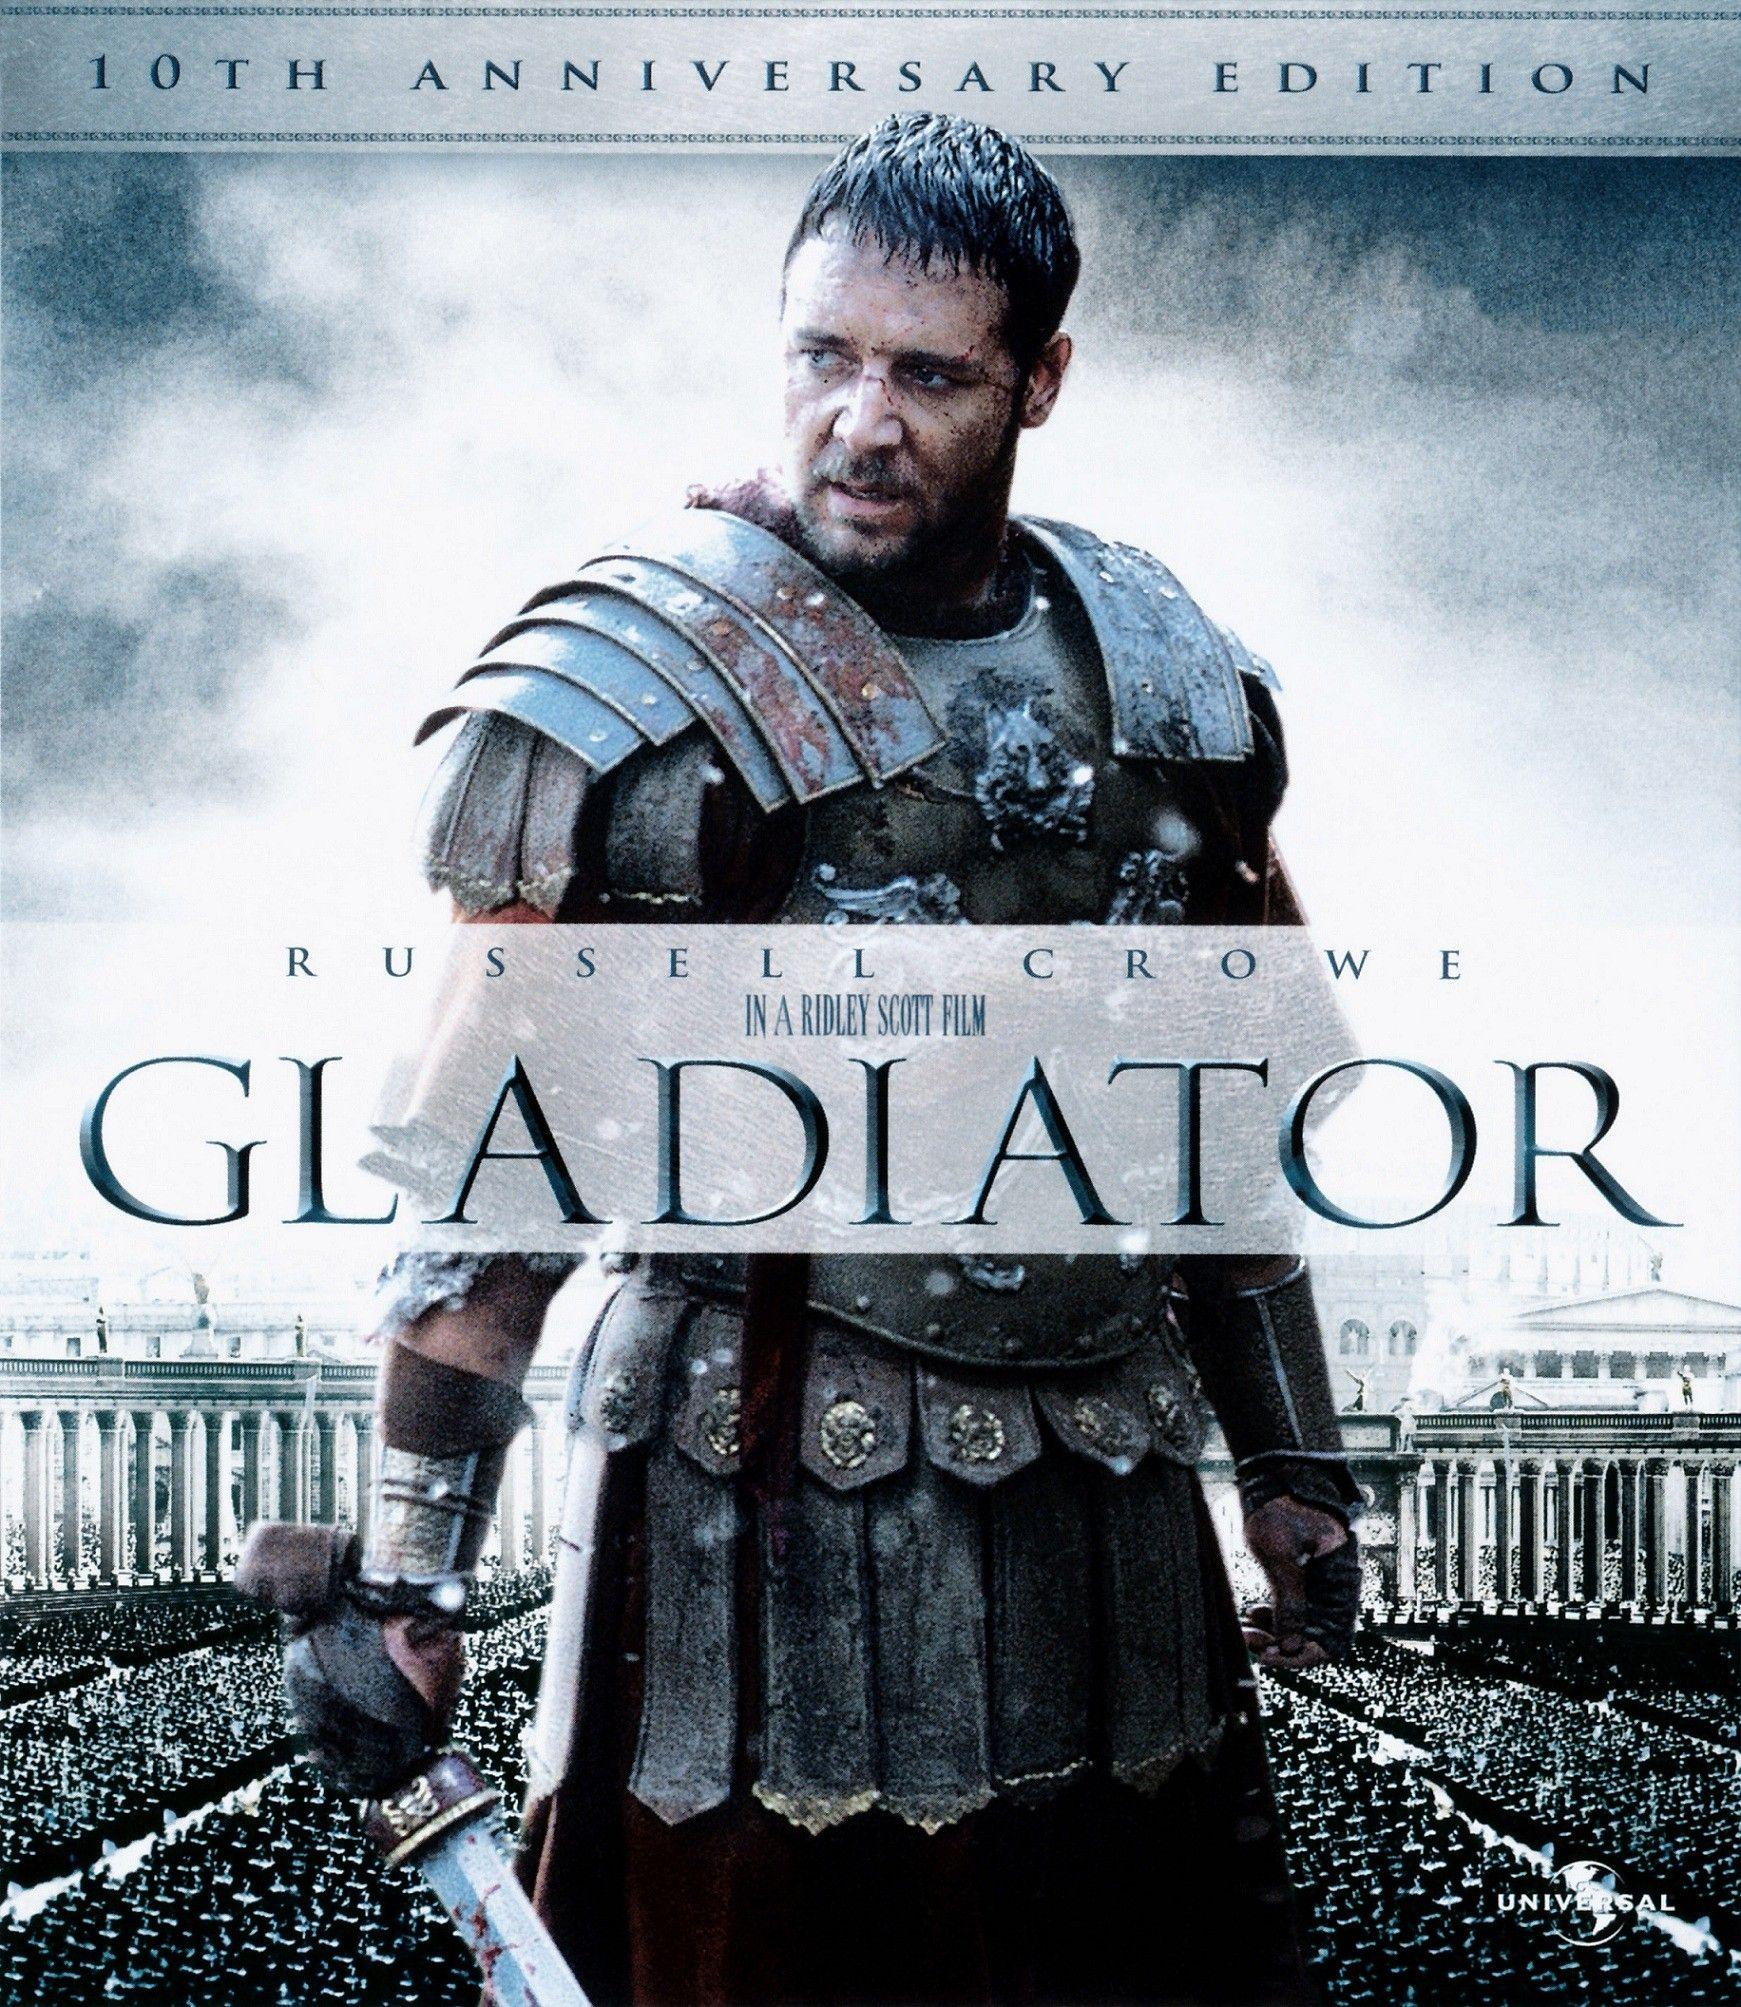 Gladiator (2000) ORIGINAL Extended DD5.1 CH 640Kbps AC3 Hindi Audio 783MB